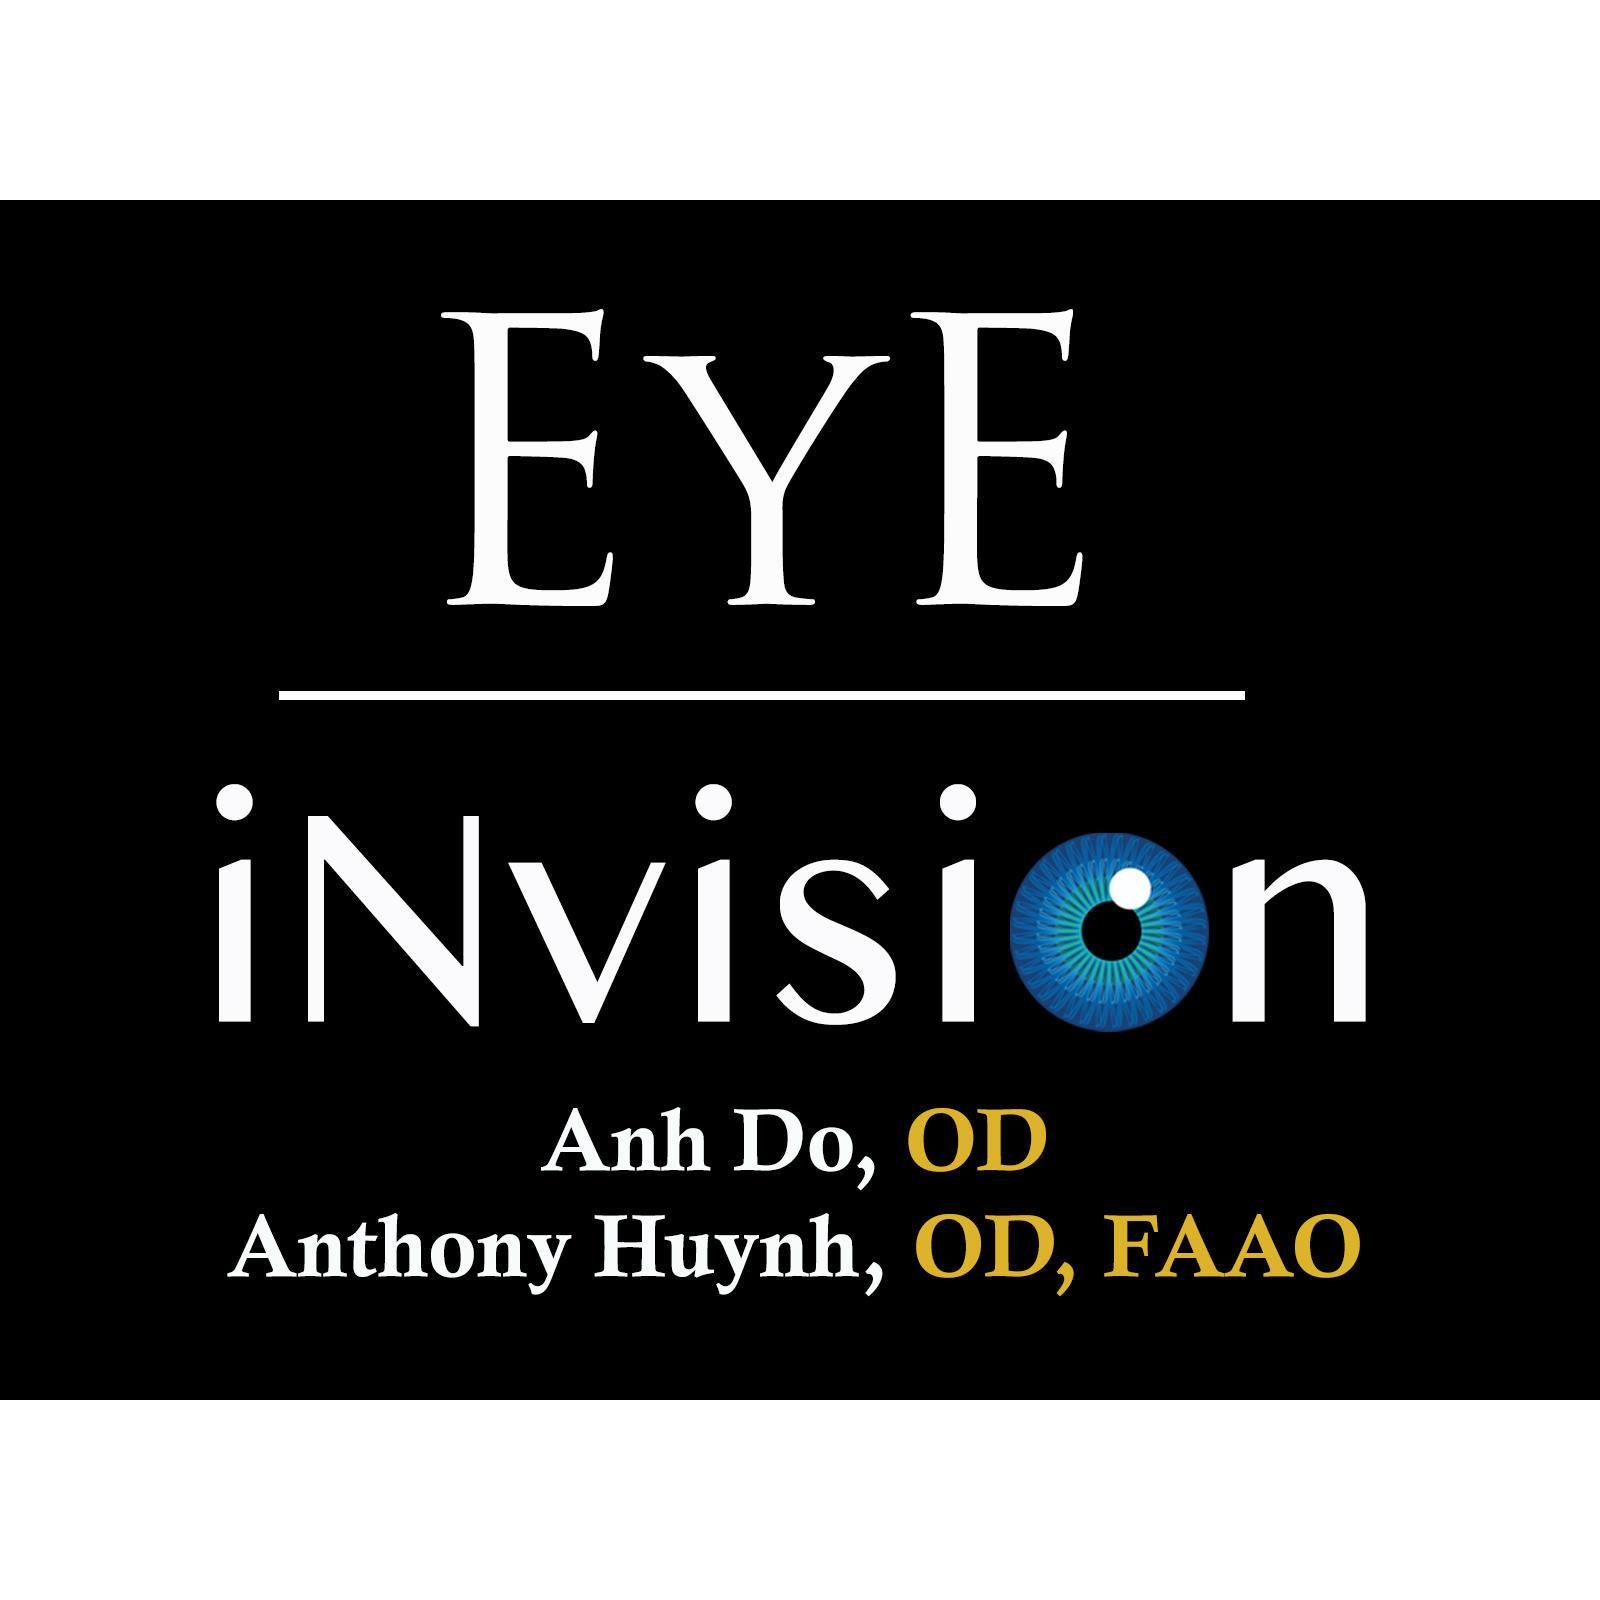 EYE Invision image 4